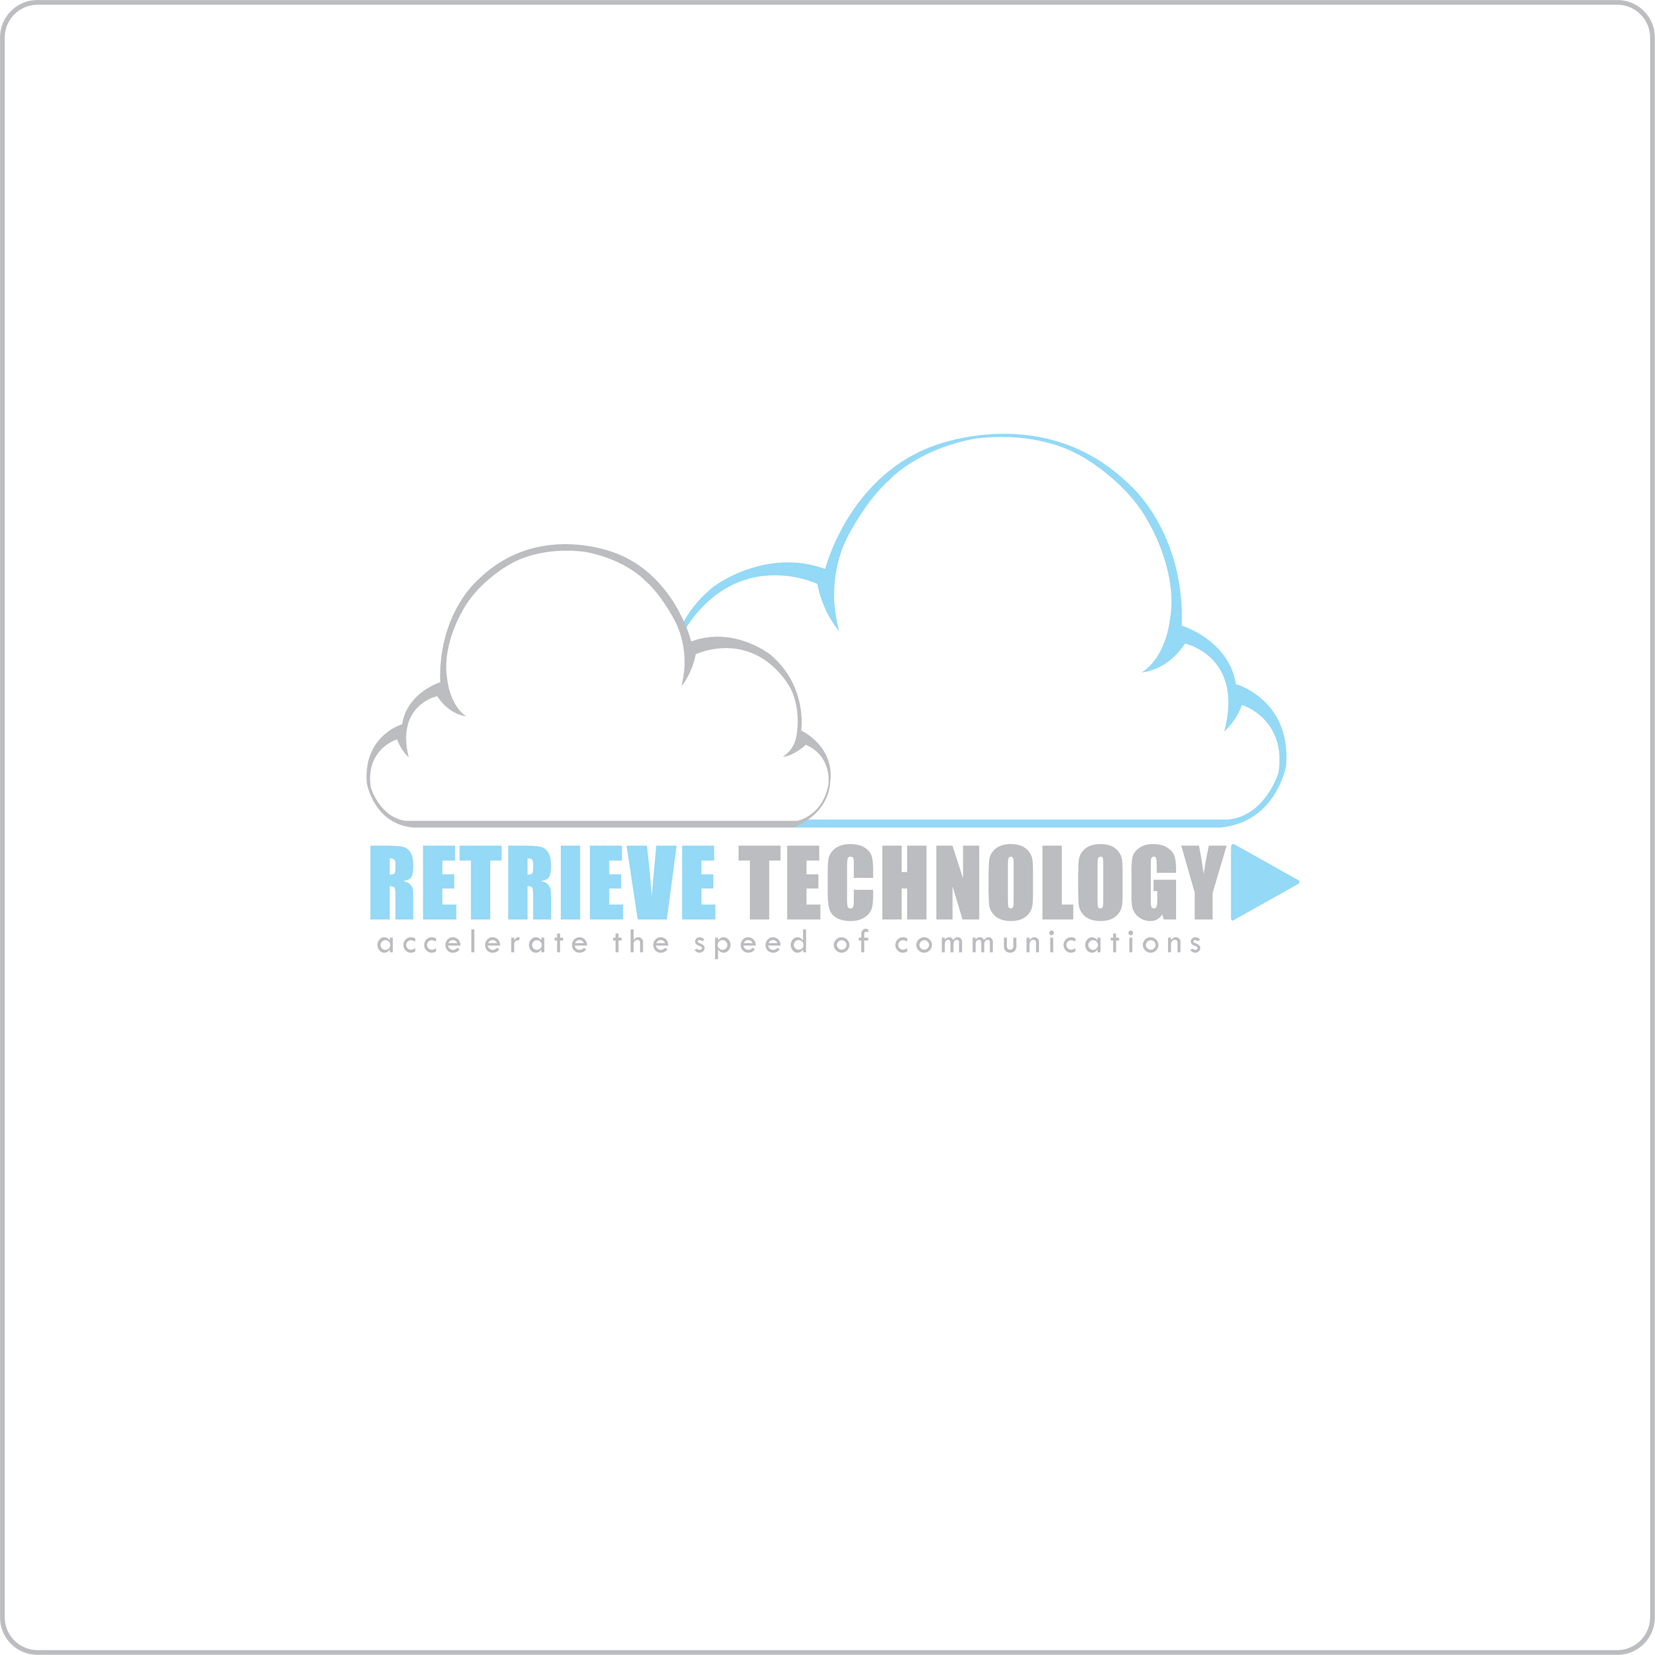 Logo Design by Ivan Kiel Montalbo - Entry No. 12 in the Logo Design Contest Artistic Logo Design for Retrieve Technologies.